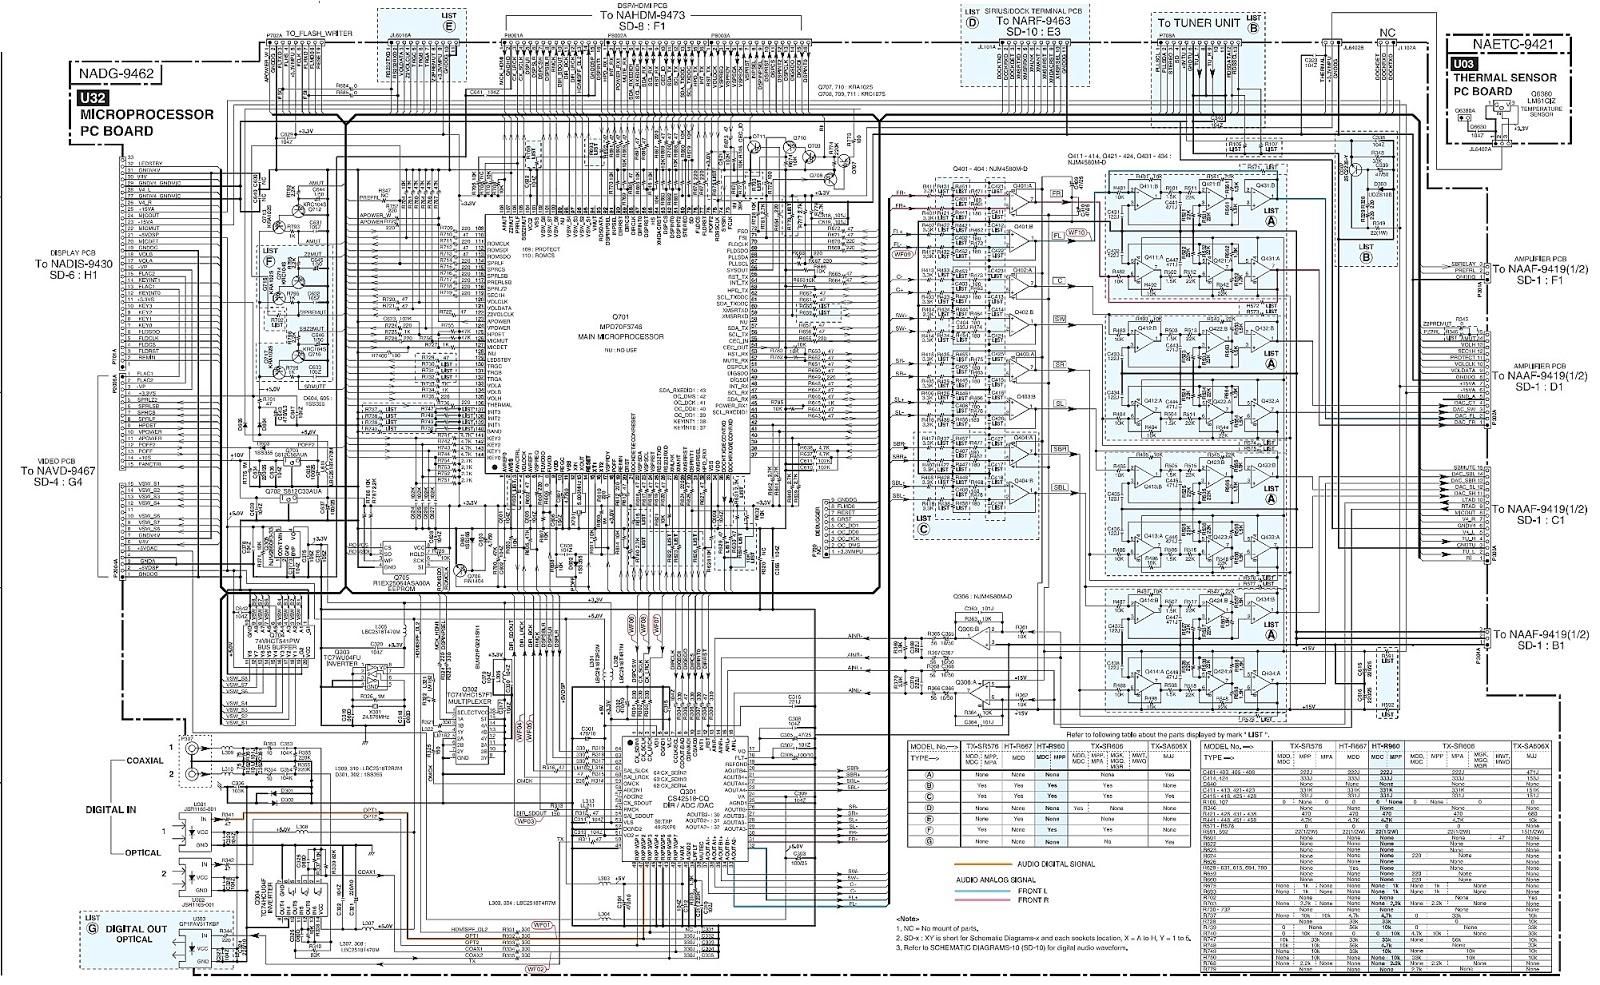 1968 Camaro Ignition Key Switch Wire Diagram Wiring Auto Vendo 63 Simple Diagrams Distribution Board